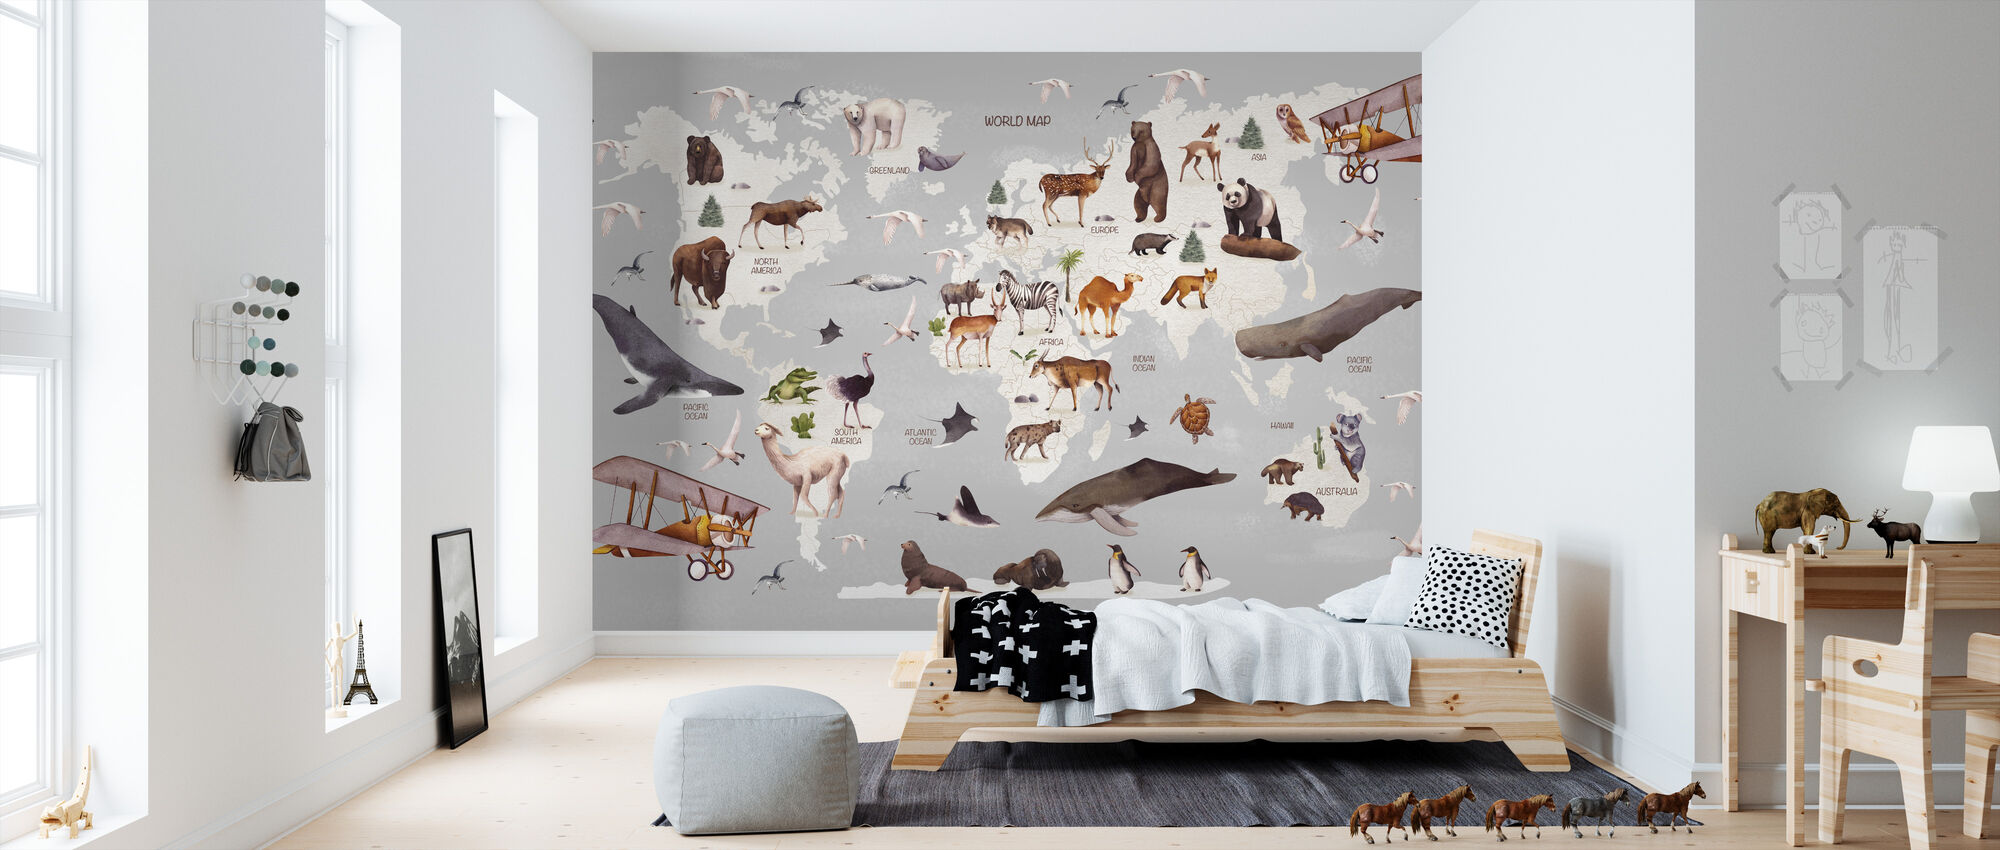 World of Animals Karta - Tapet - Barnrum